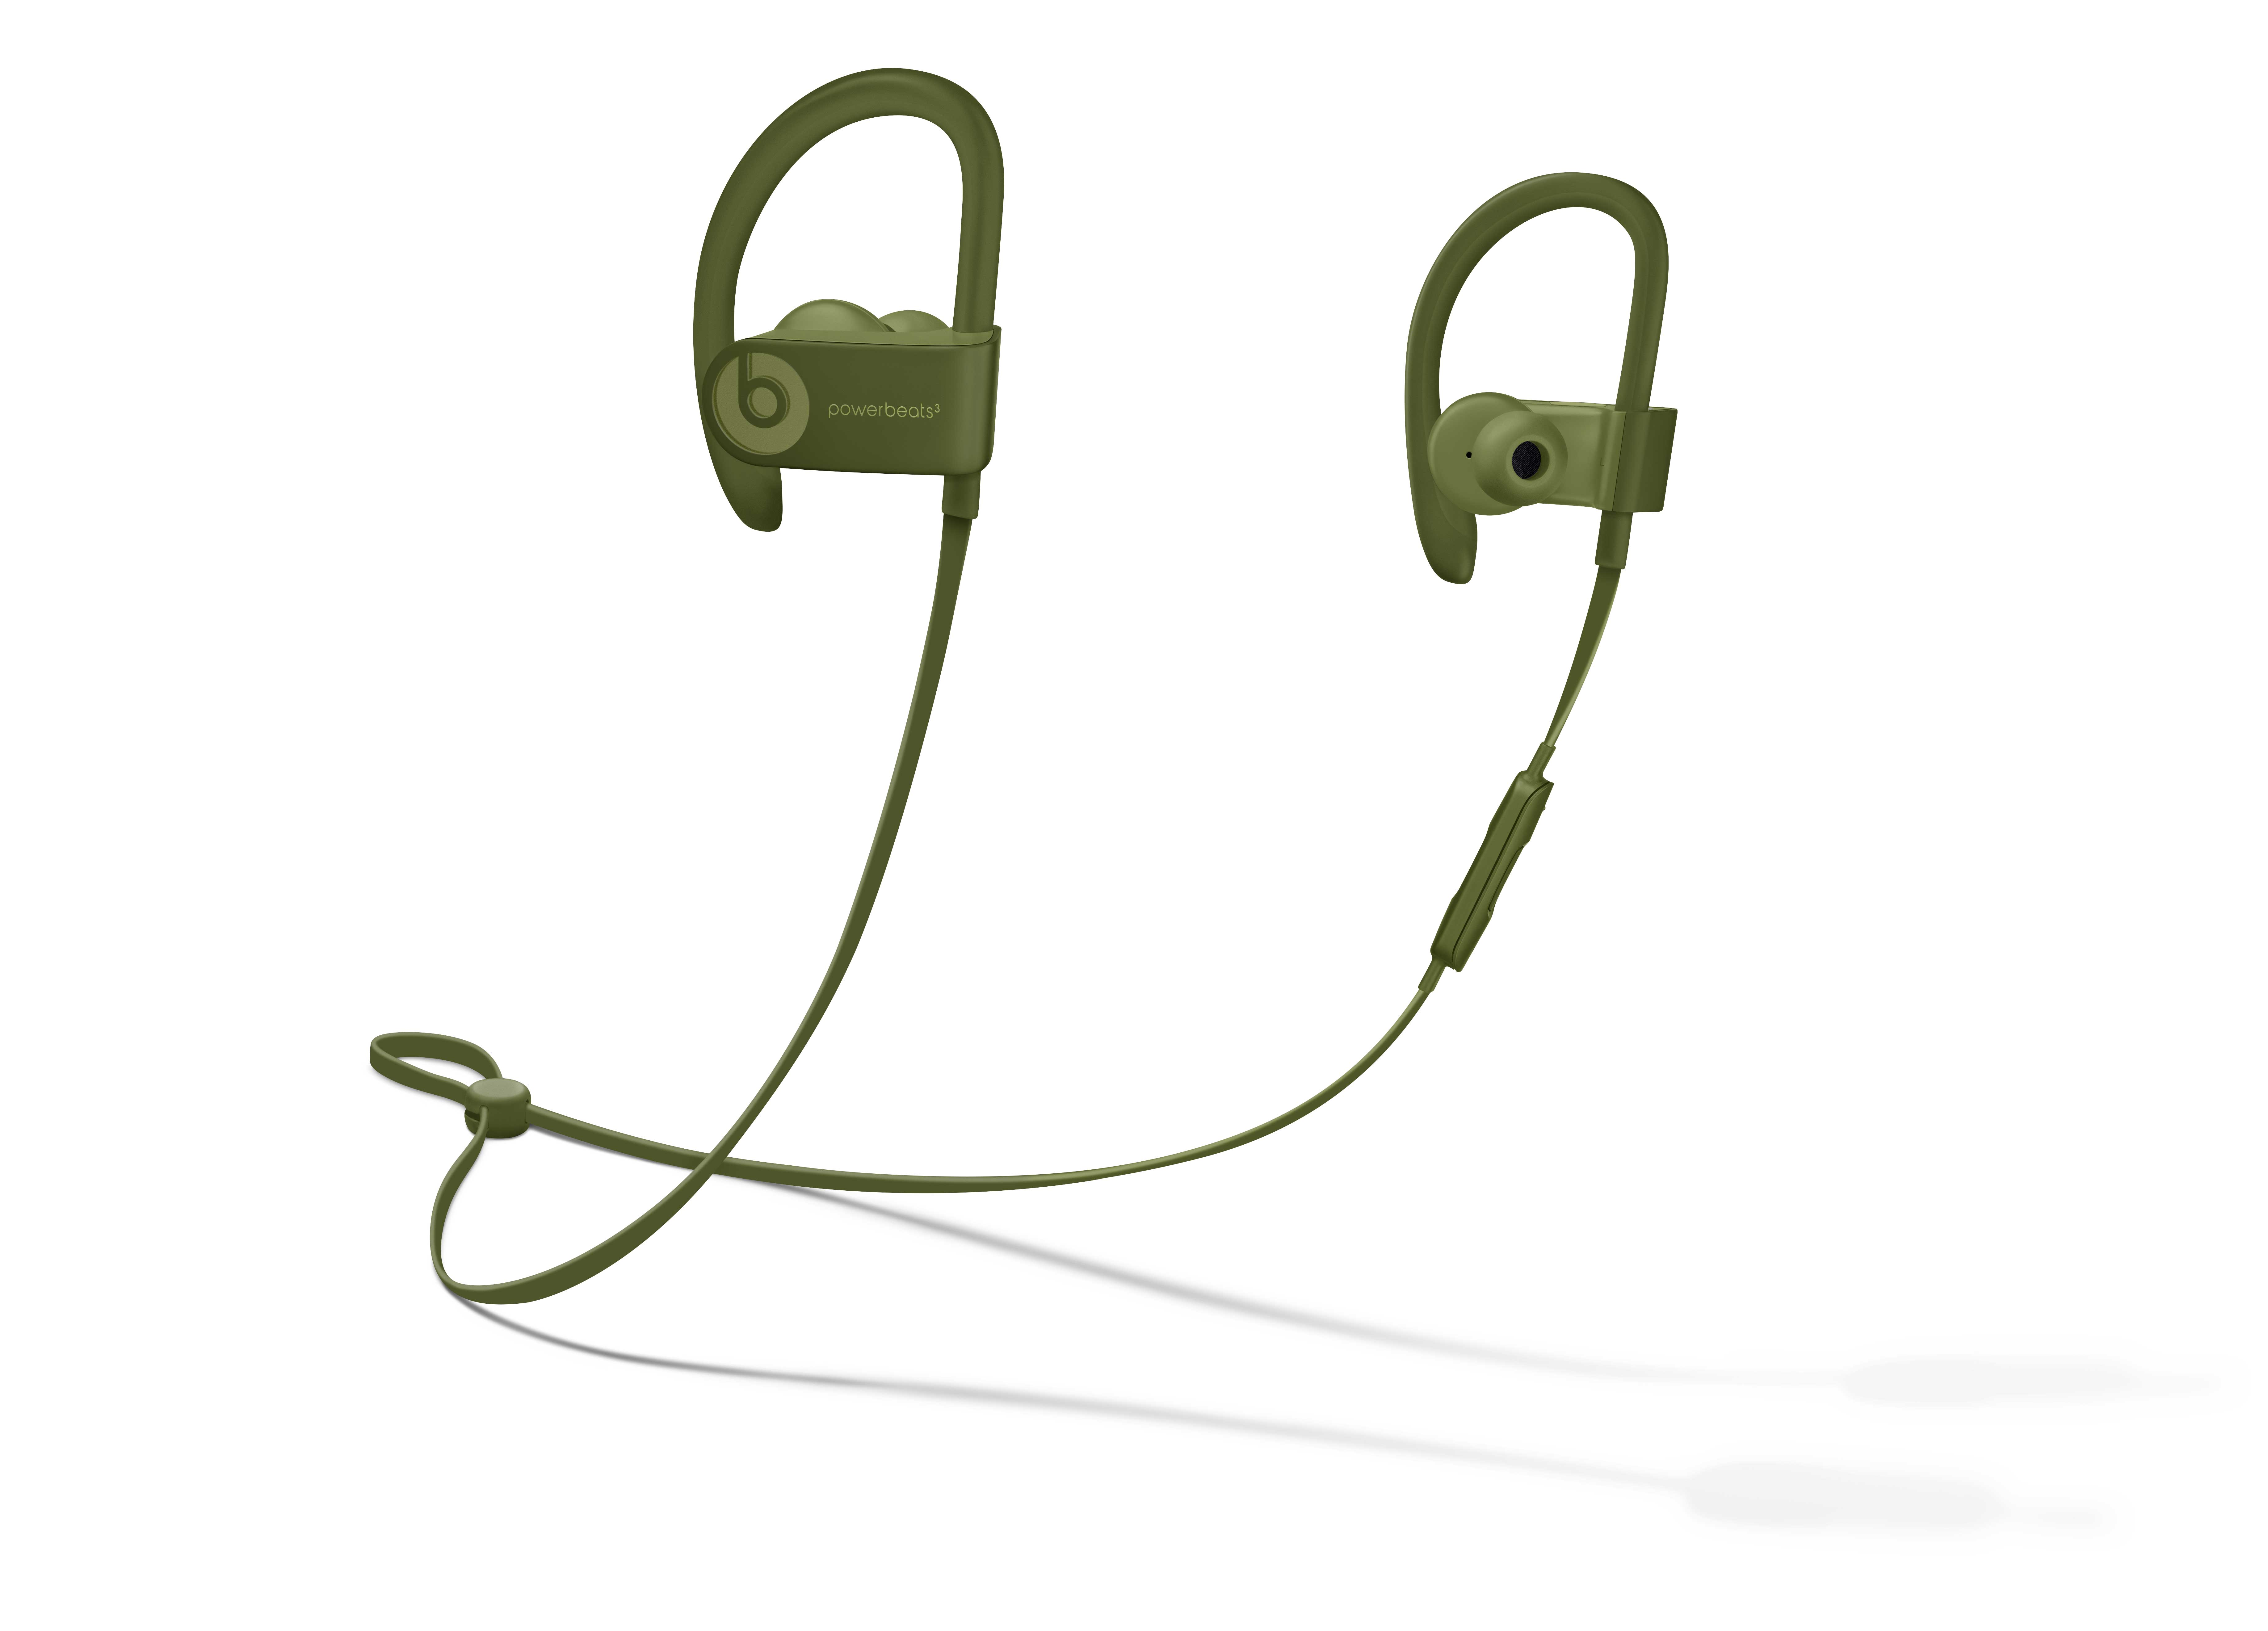 a6329a12165 Beats Powerbeats3 Wireless Earphones - Walmart.com